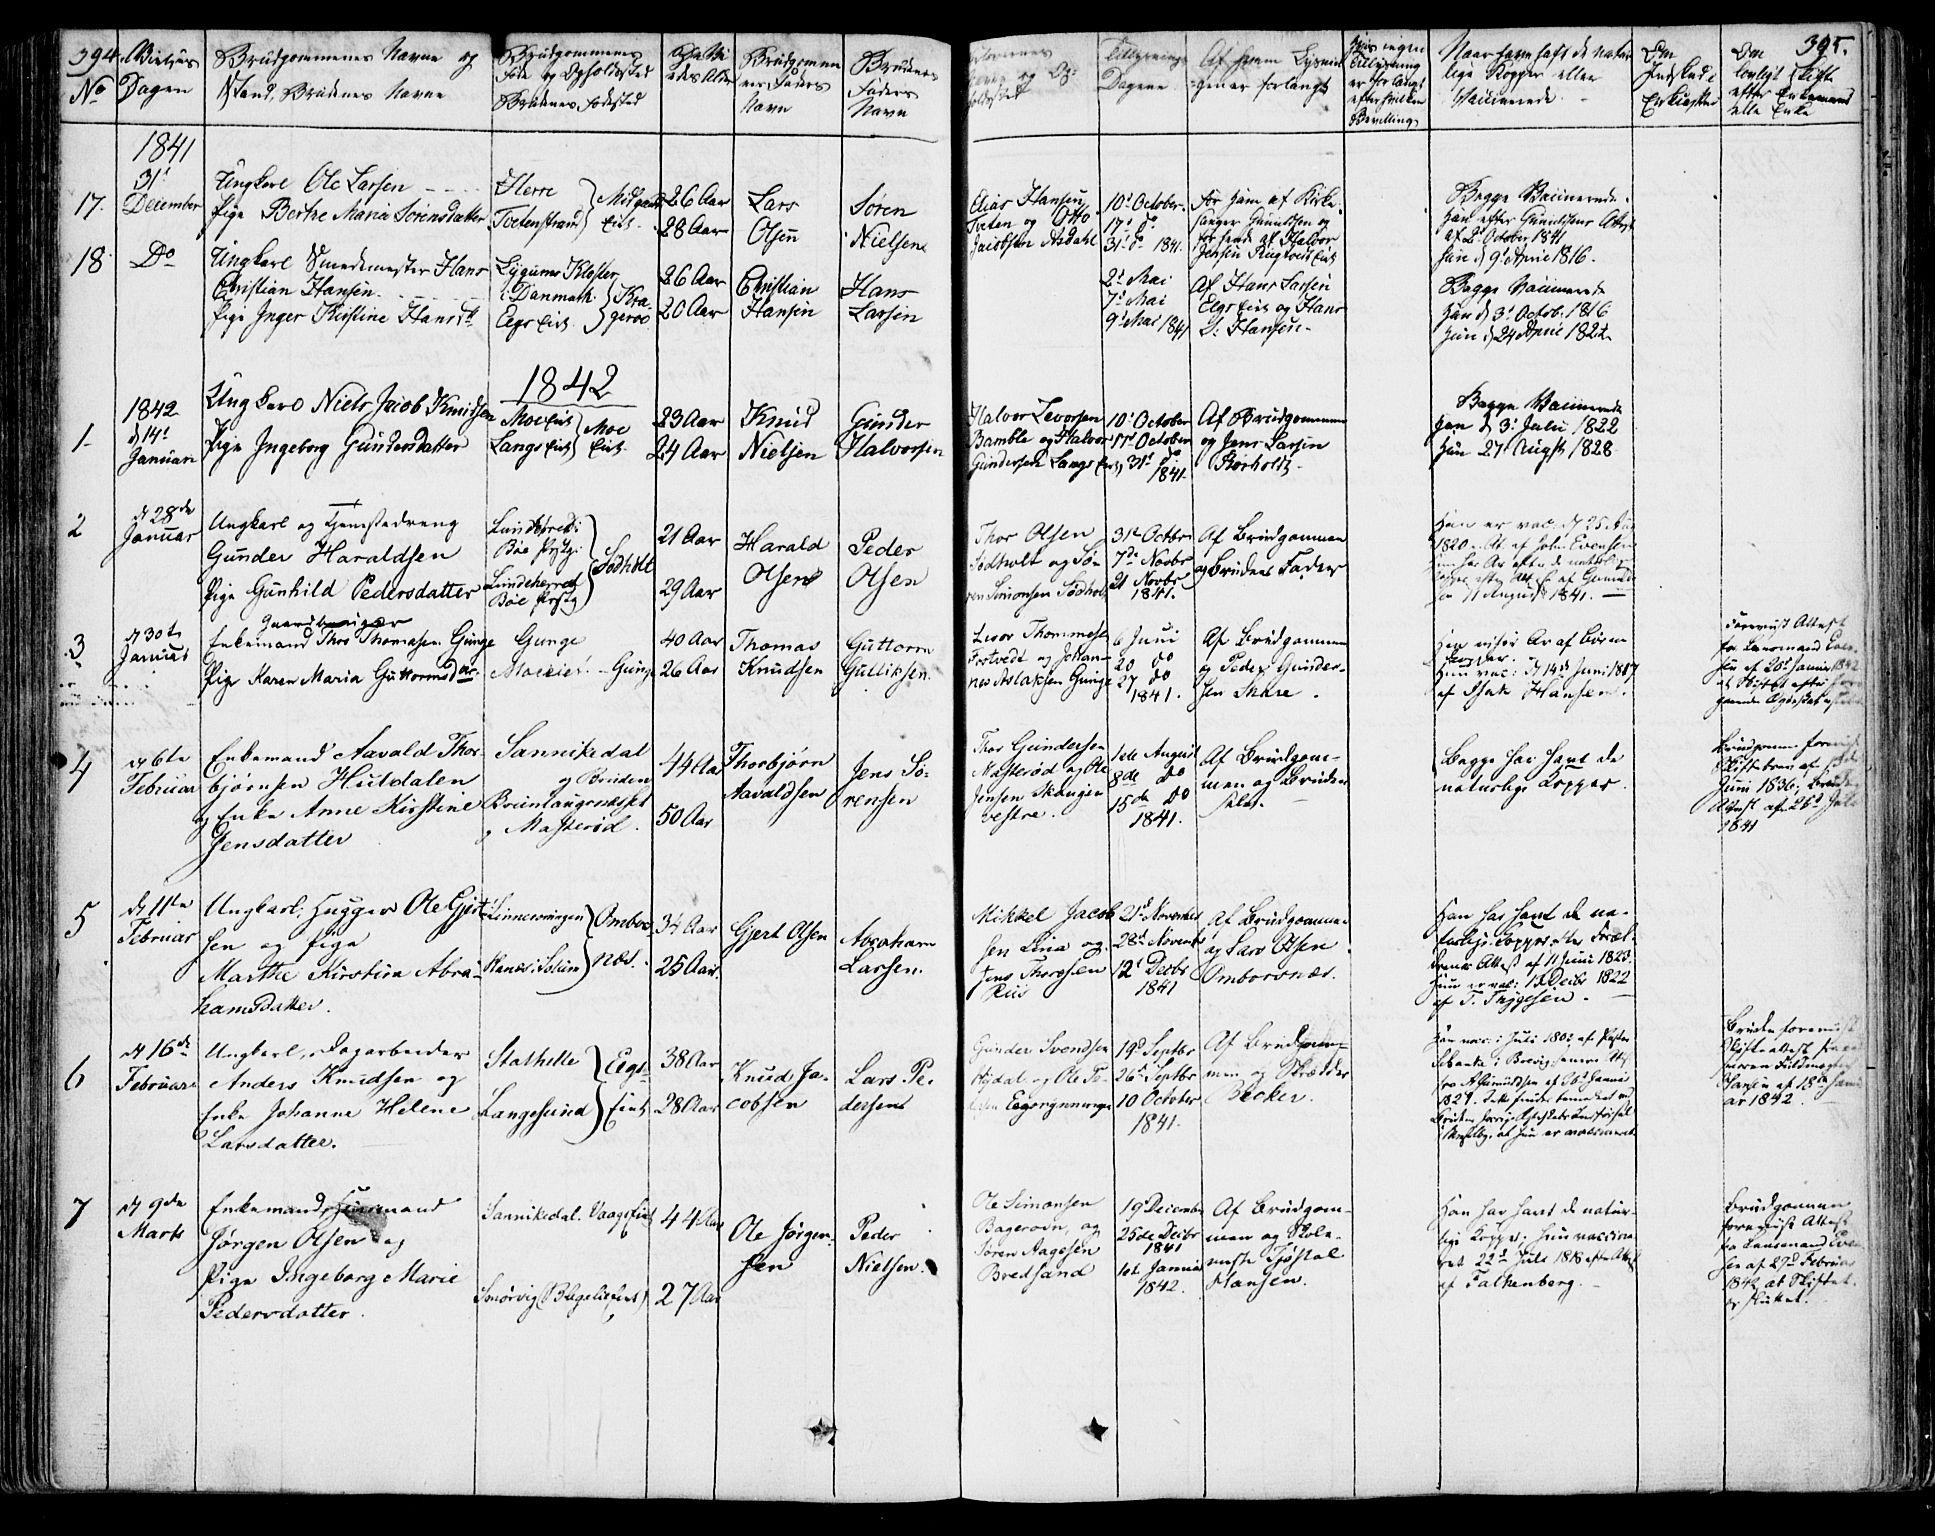 SAKO, Bamble kirkebøker, F/Fa/L0004: Ministerialbok nr. I 4, 1834-1853, s. 394-395